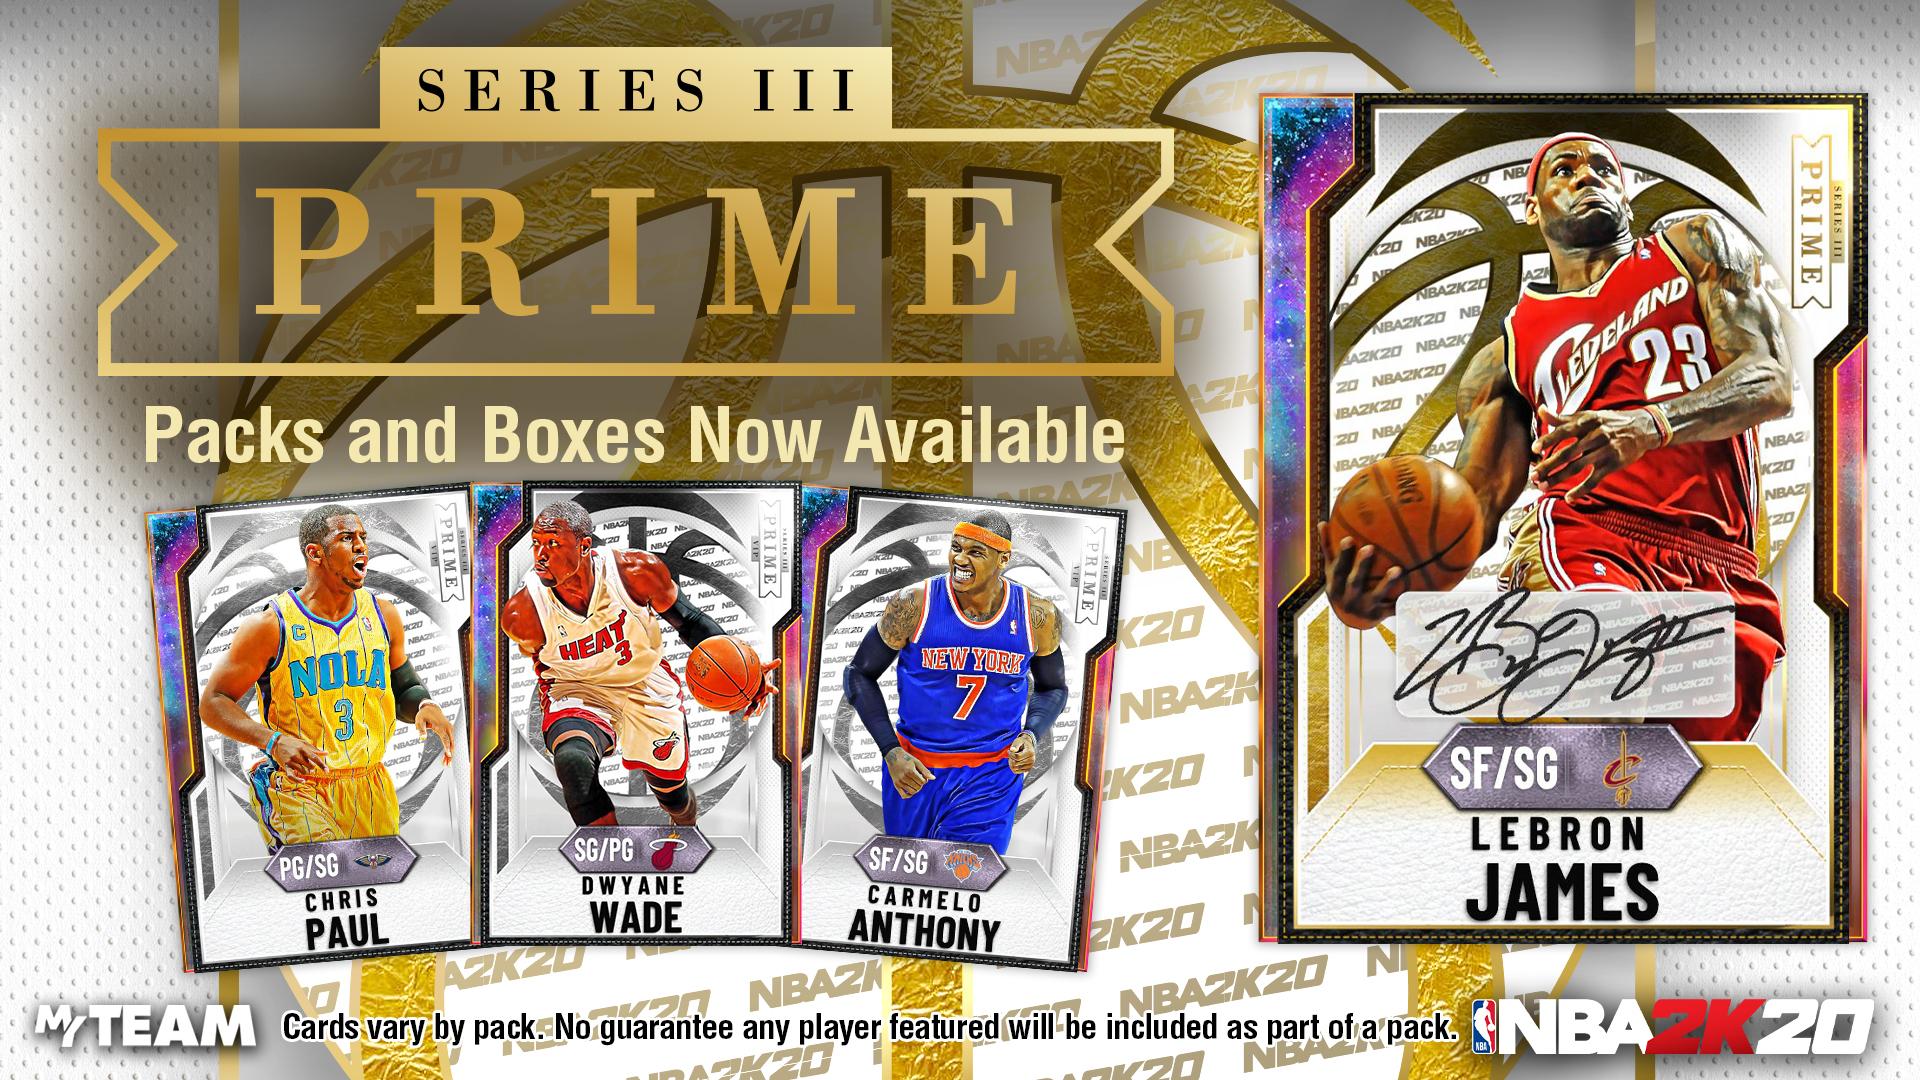 PRIME Series III: LeBron James